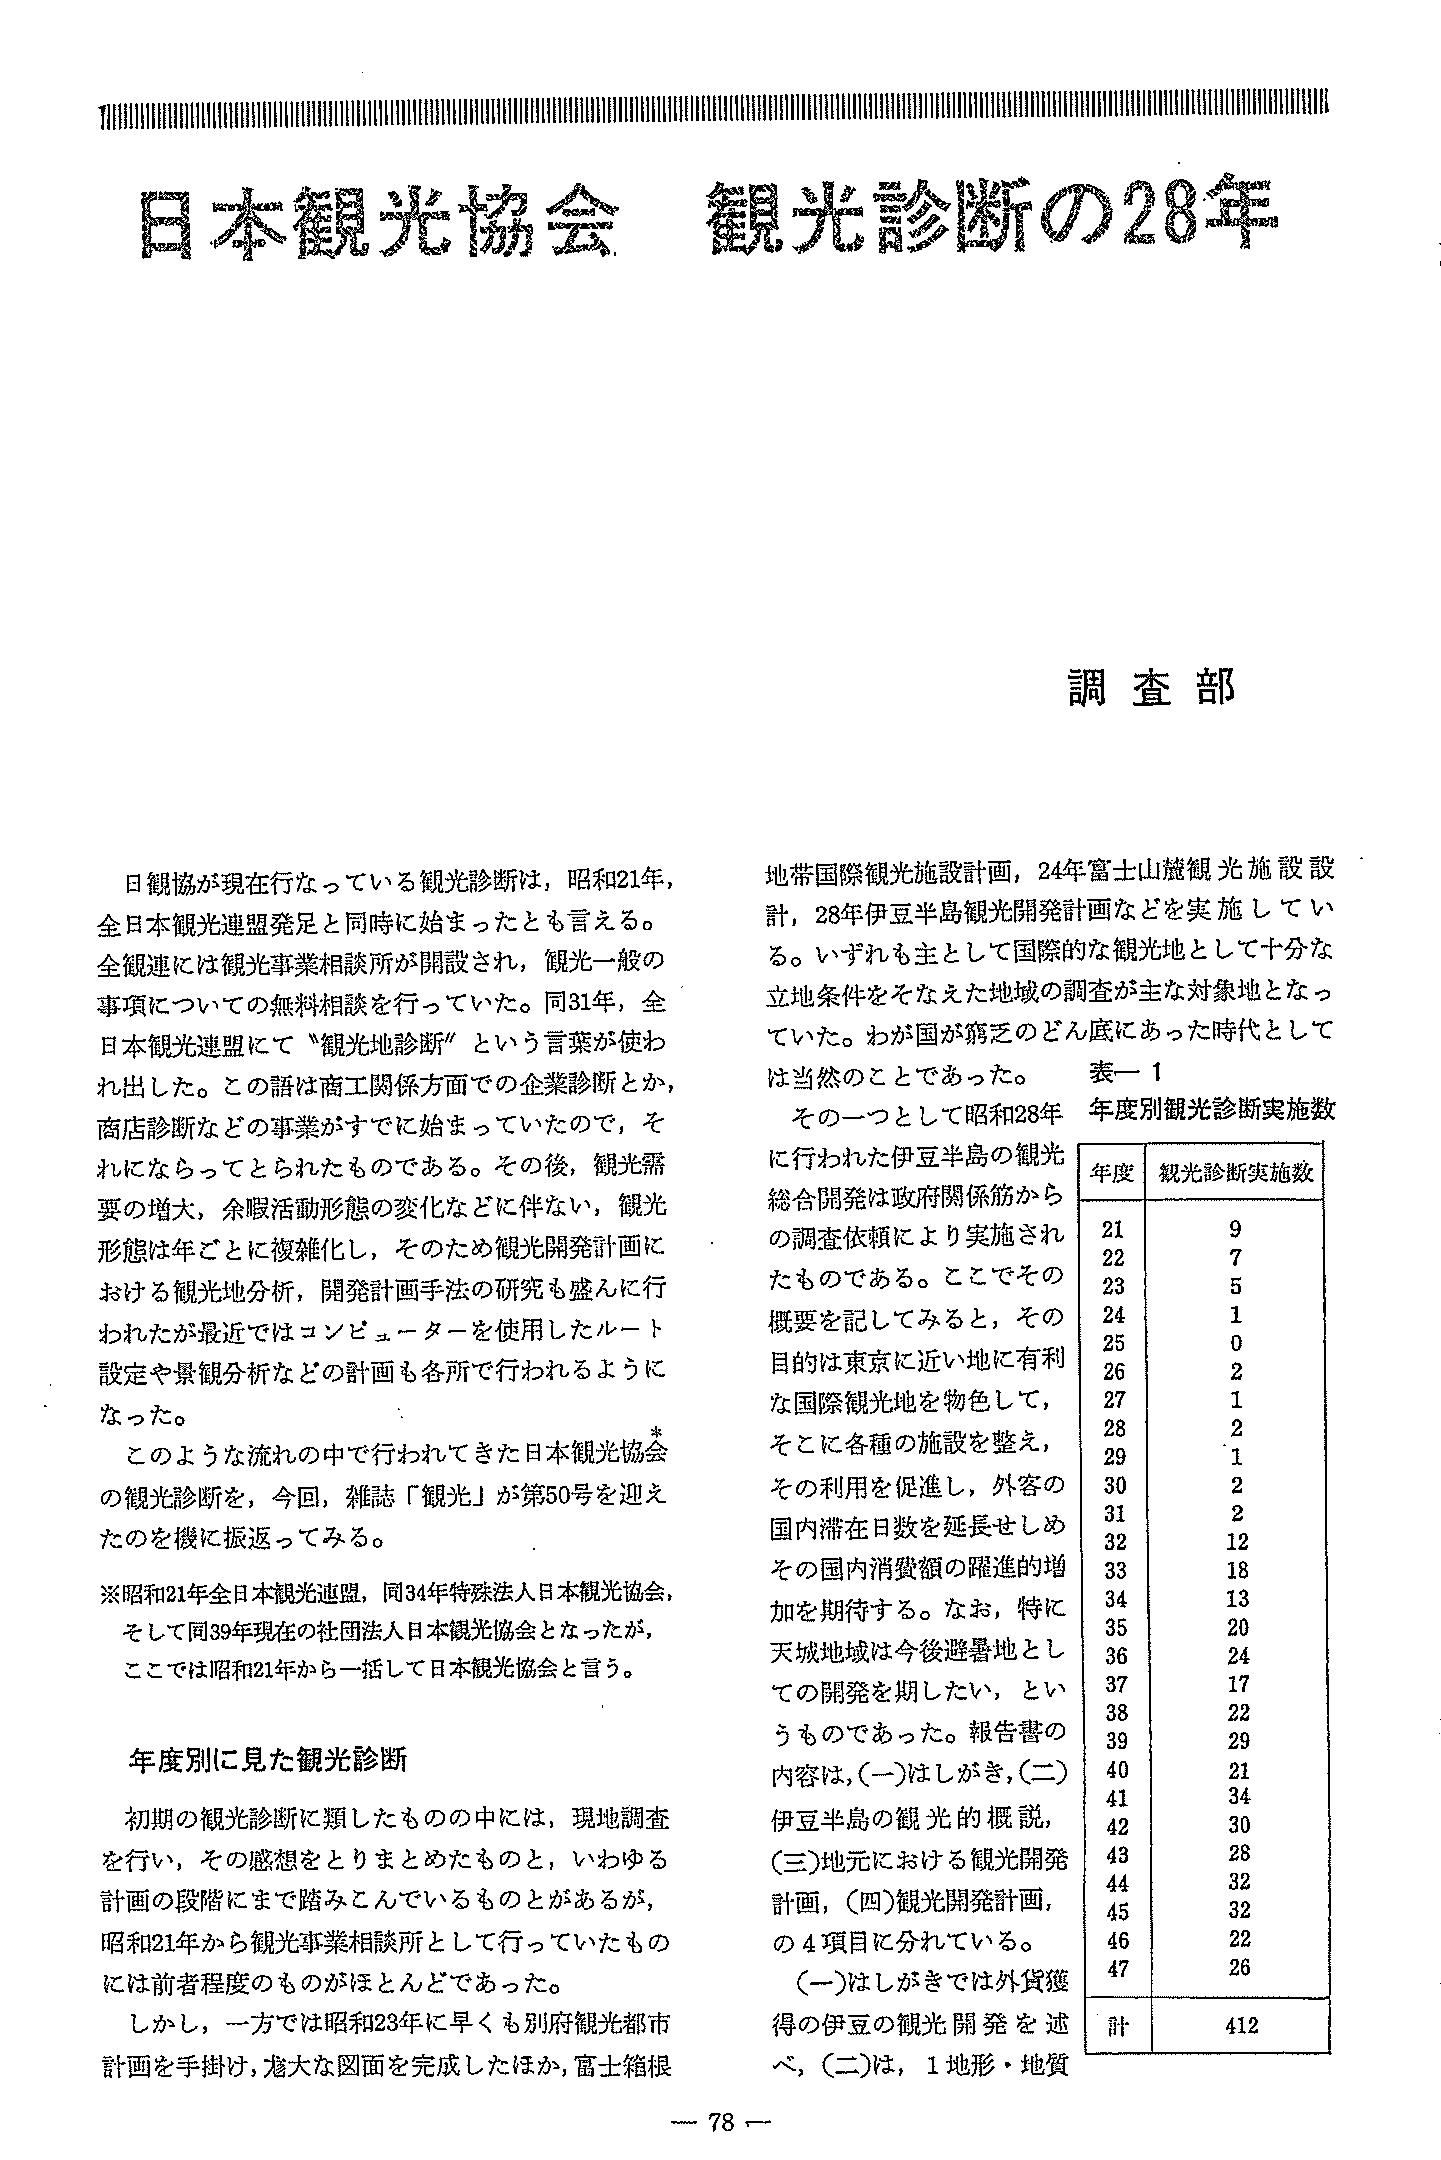 図1 日本観光協会観光診断の28年